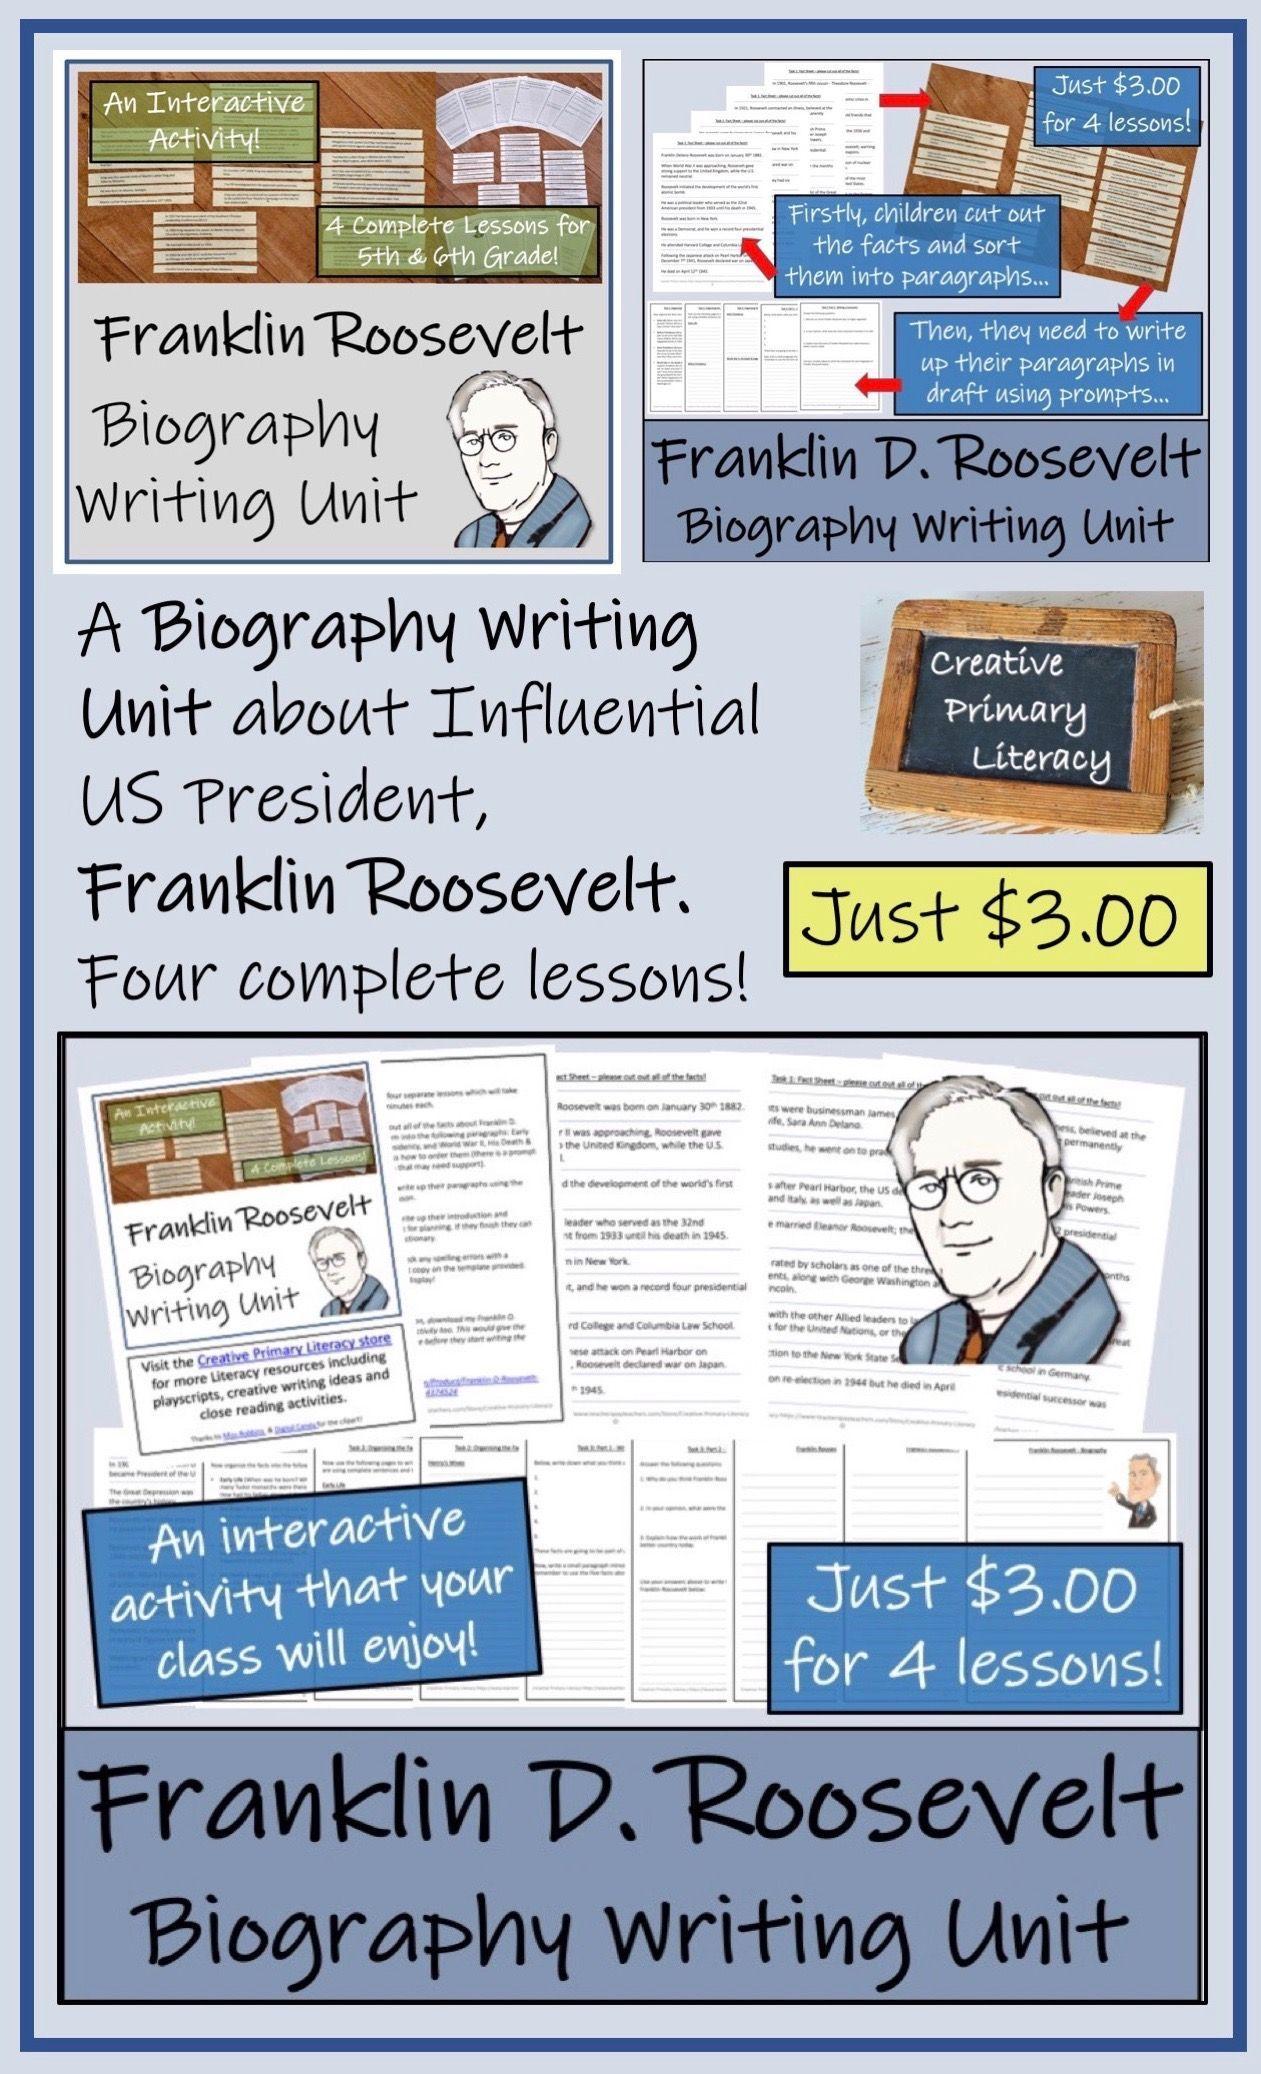 Franklin d roosevelt 5th grade 6th grade biography